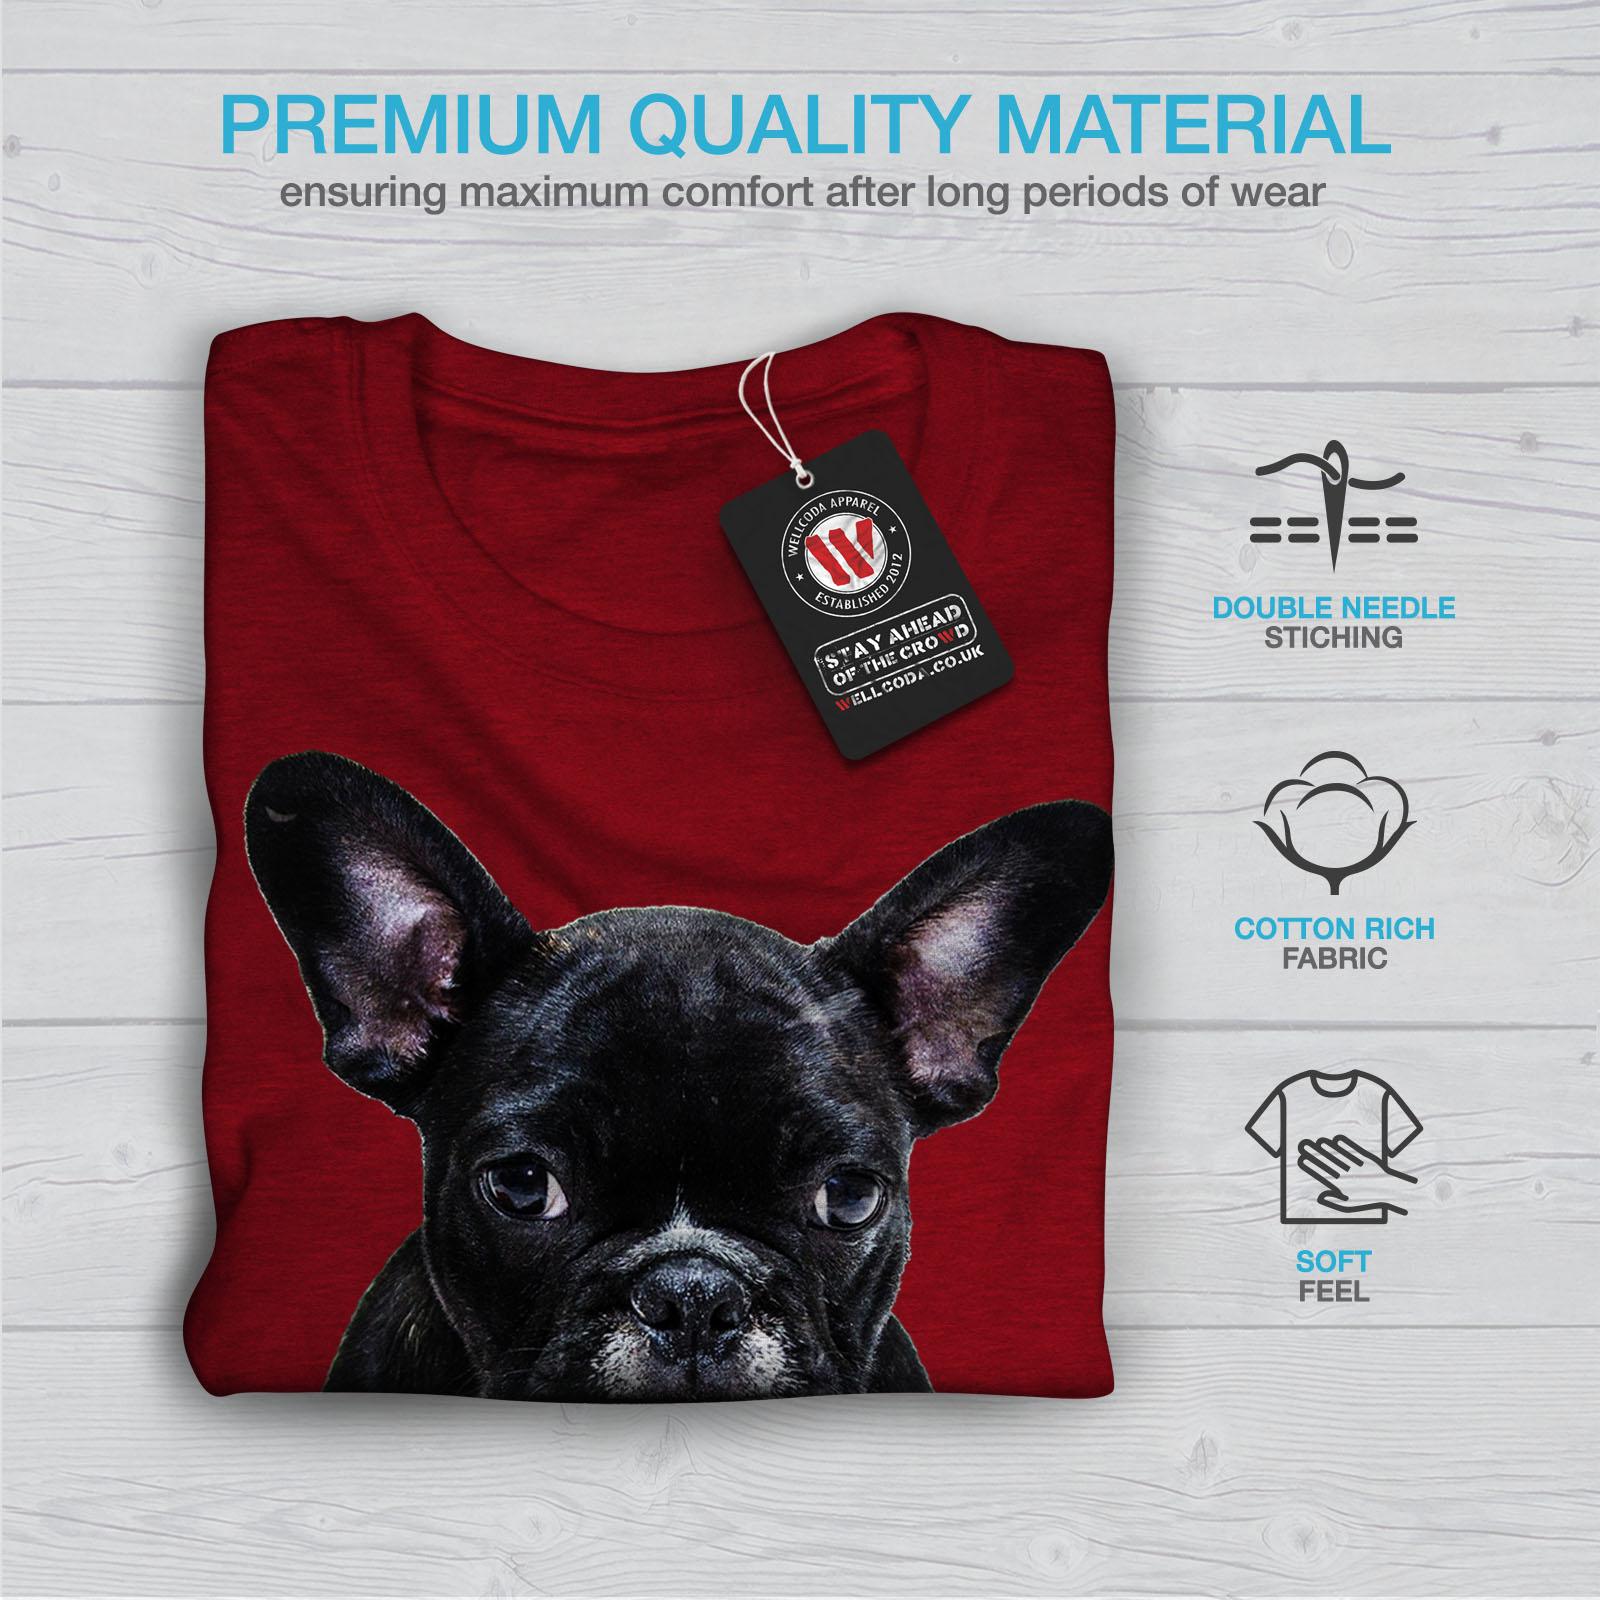 Wellcoda-Fancy-French-Bulldog-T-shirt-Femme-Noir-Casual-Design-Imprime-Tee miniature 13